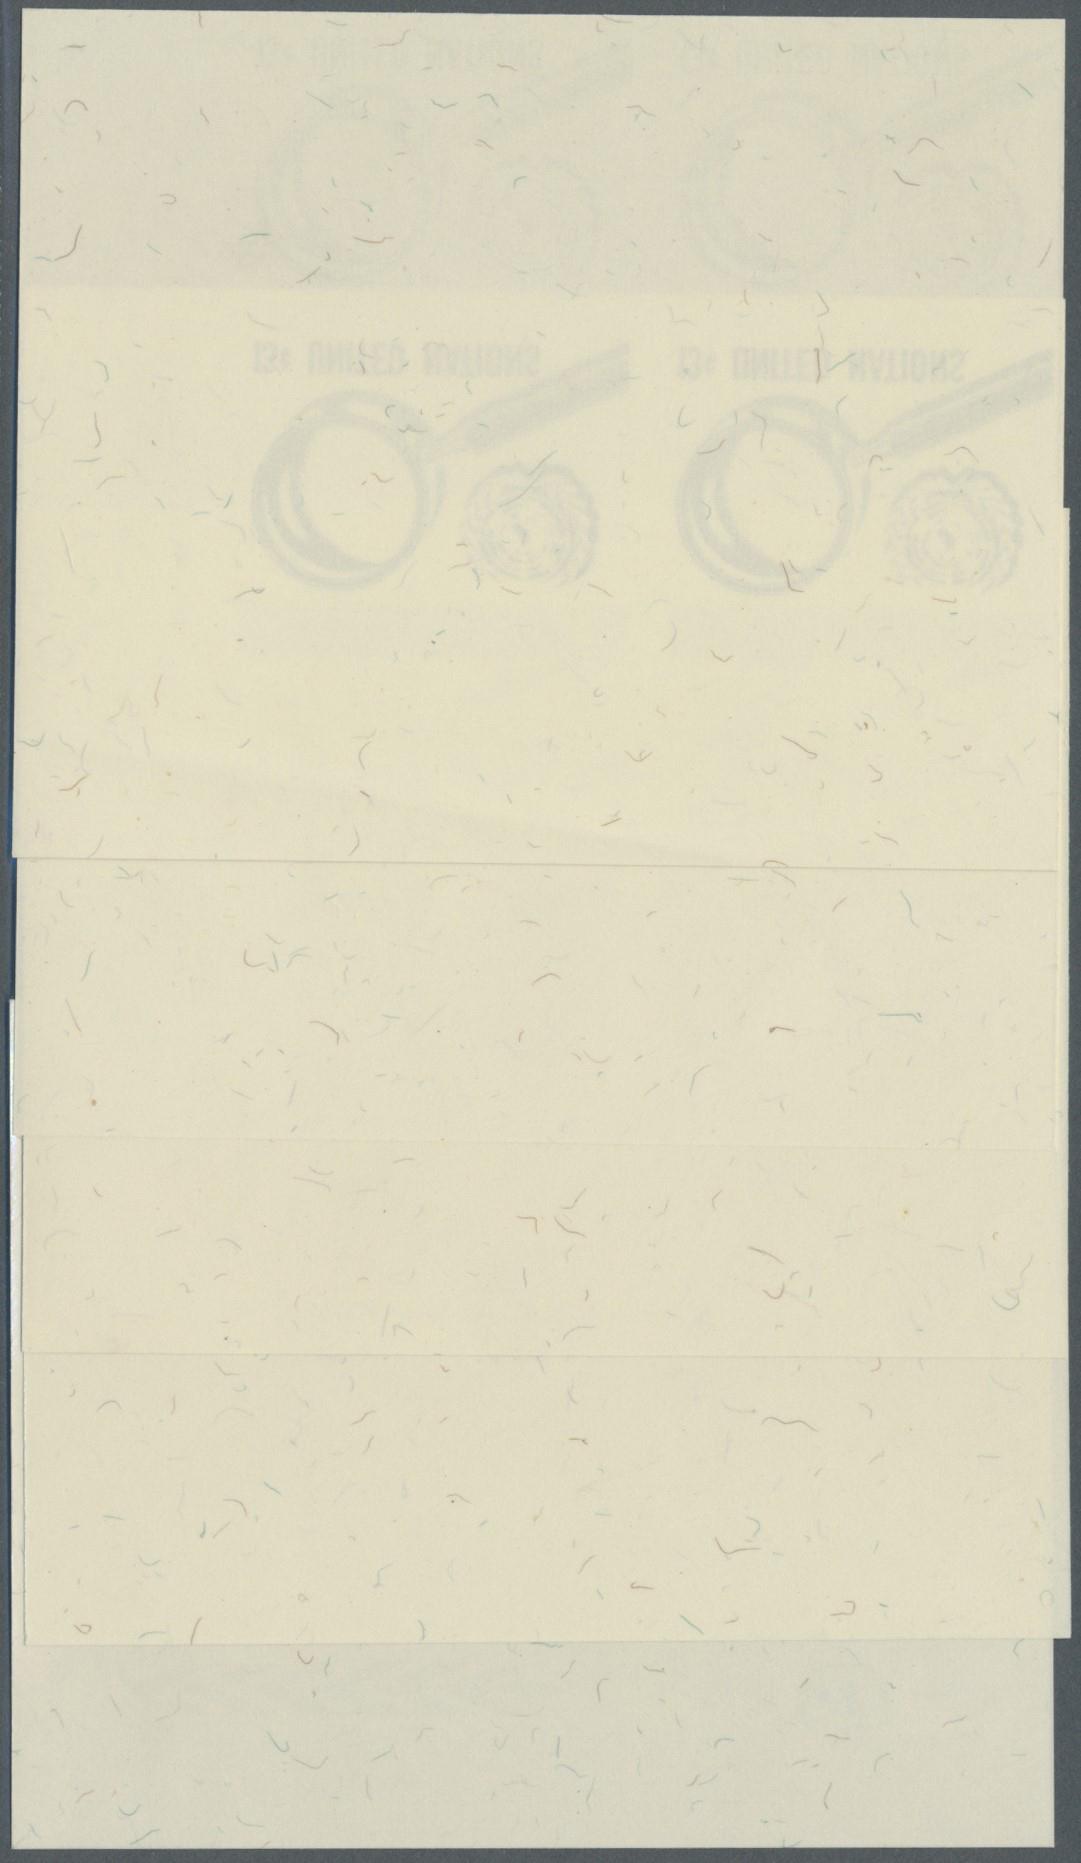 Lot 14806 - Vereinte Nationen - New York  -  Auktionshaus Christoph Gärtner GmbH & Co. KG Single lots Philately Overseas & Europe. Auction #39 Day 4